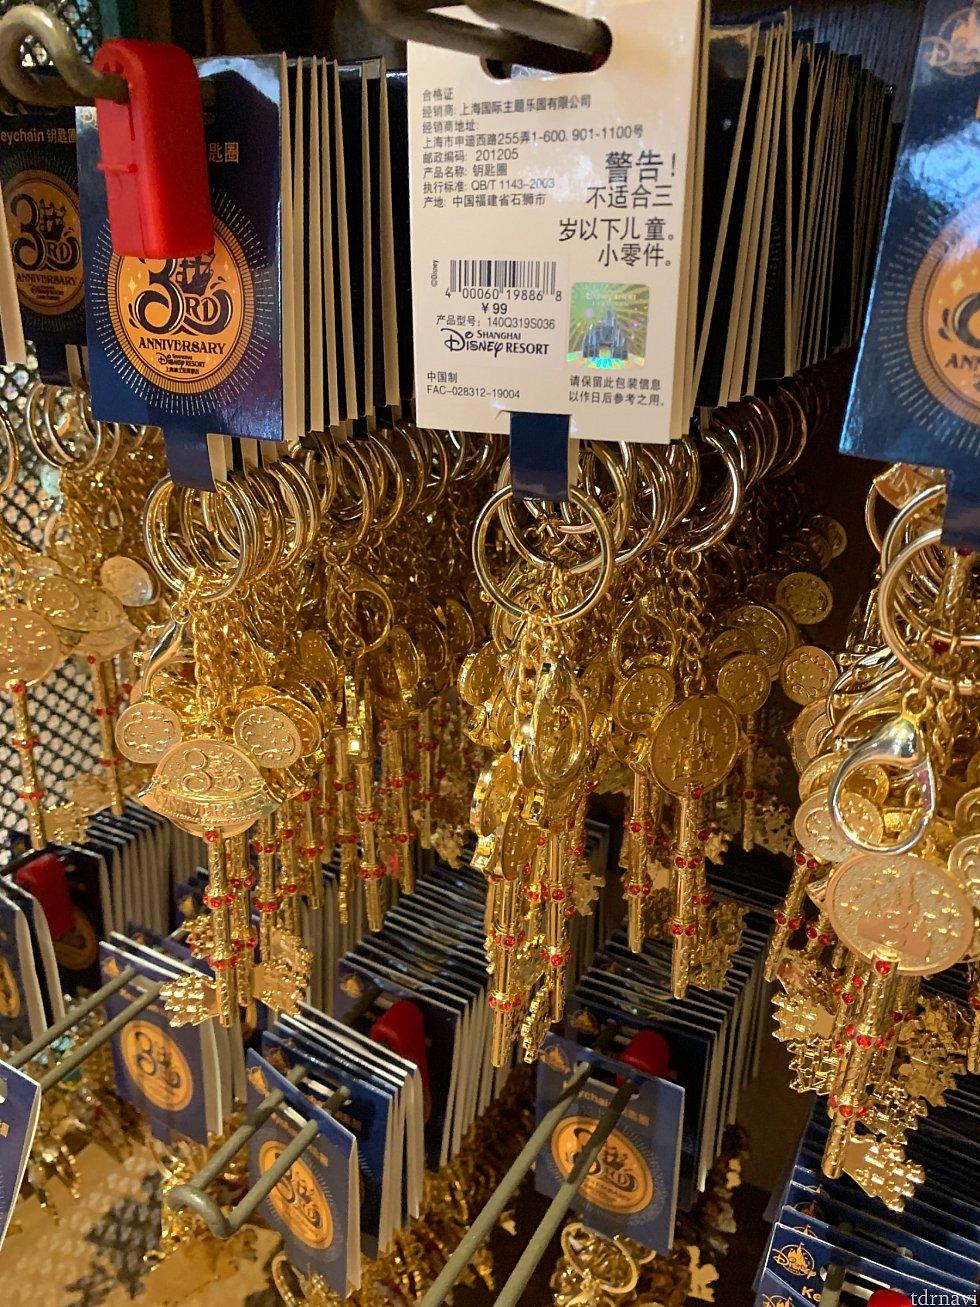 キーチェーン(鍵)99元(約1,580円)